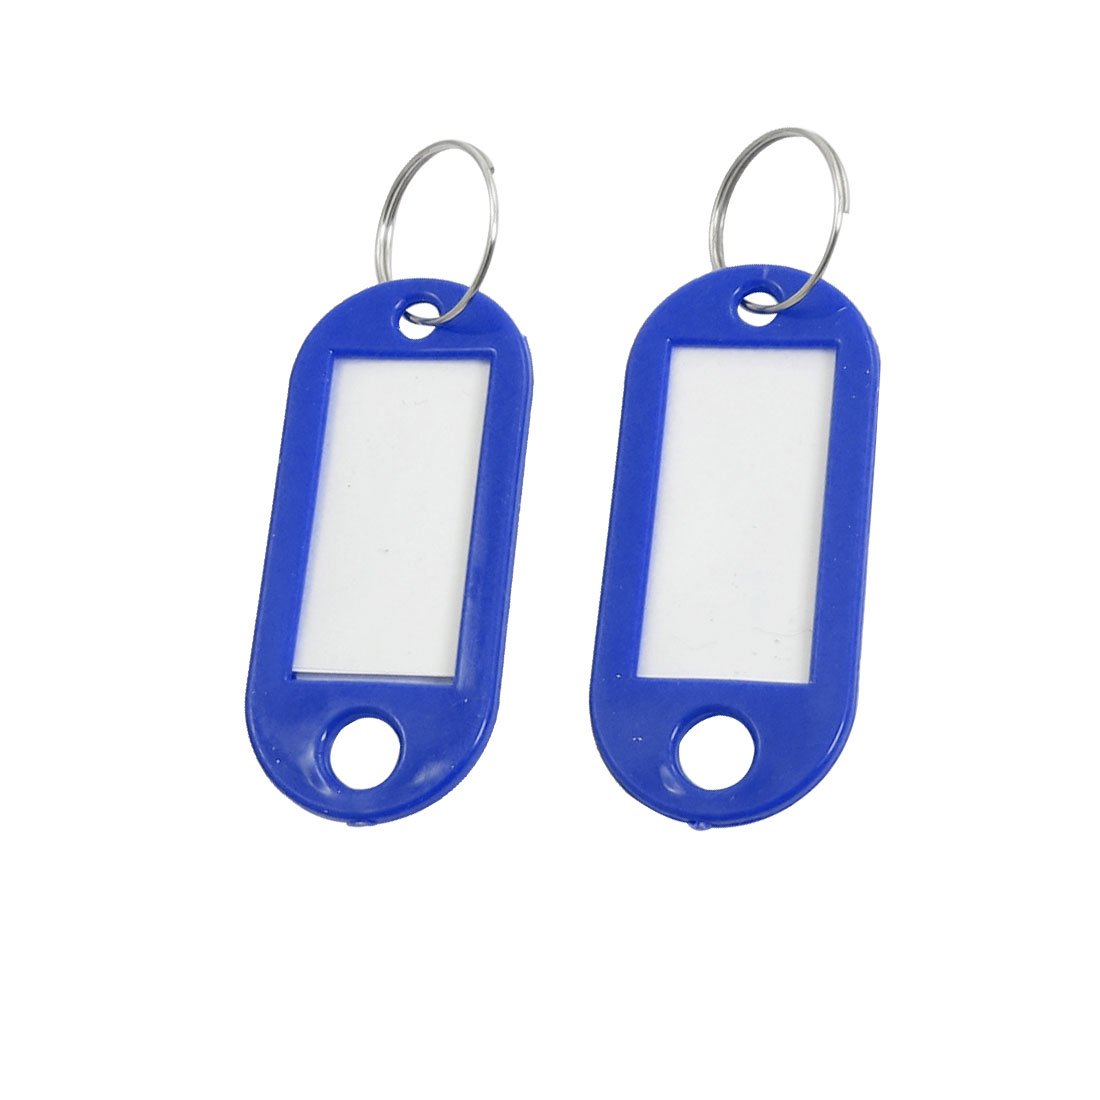 Factory Blue Plastic Mini Holder ID Key Labels Tags Keyring Keychain 10PCS